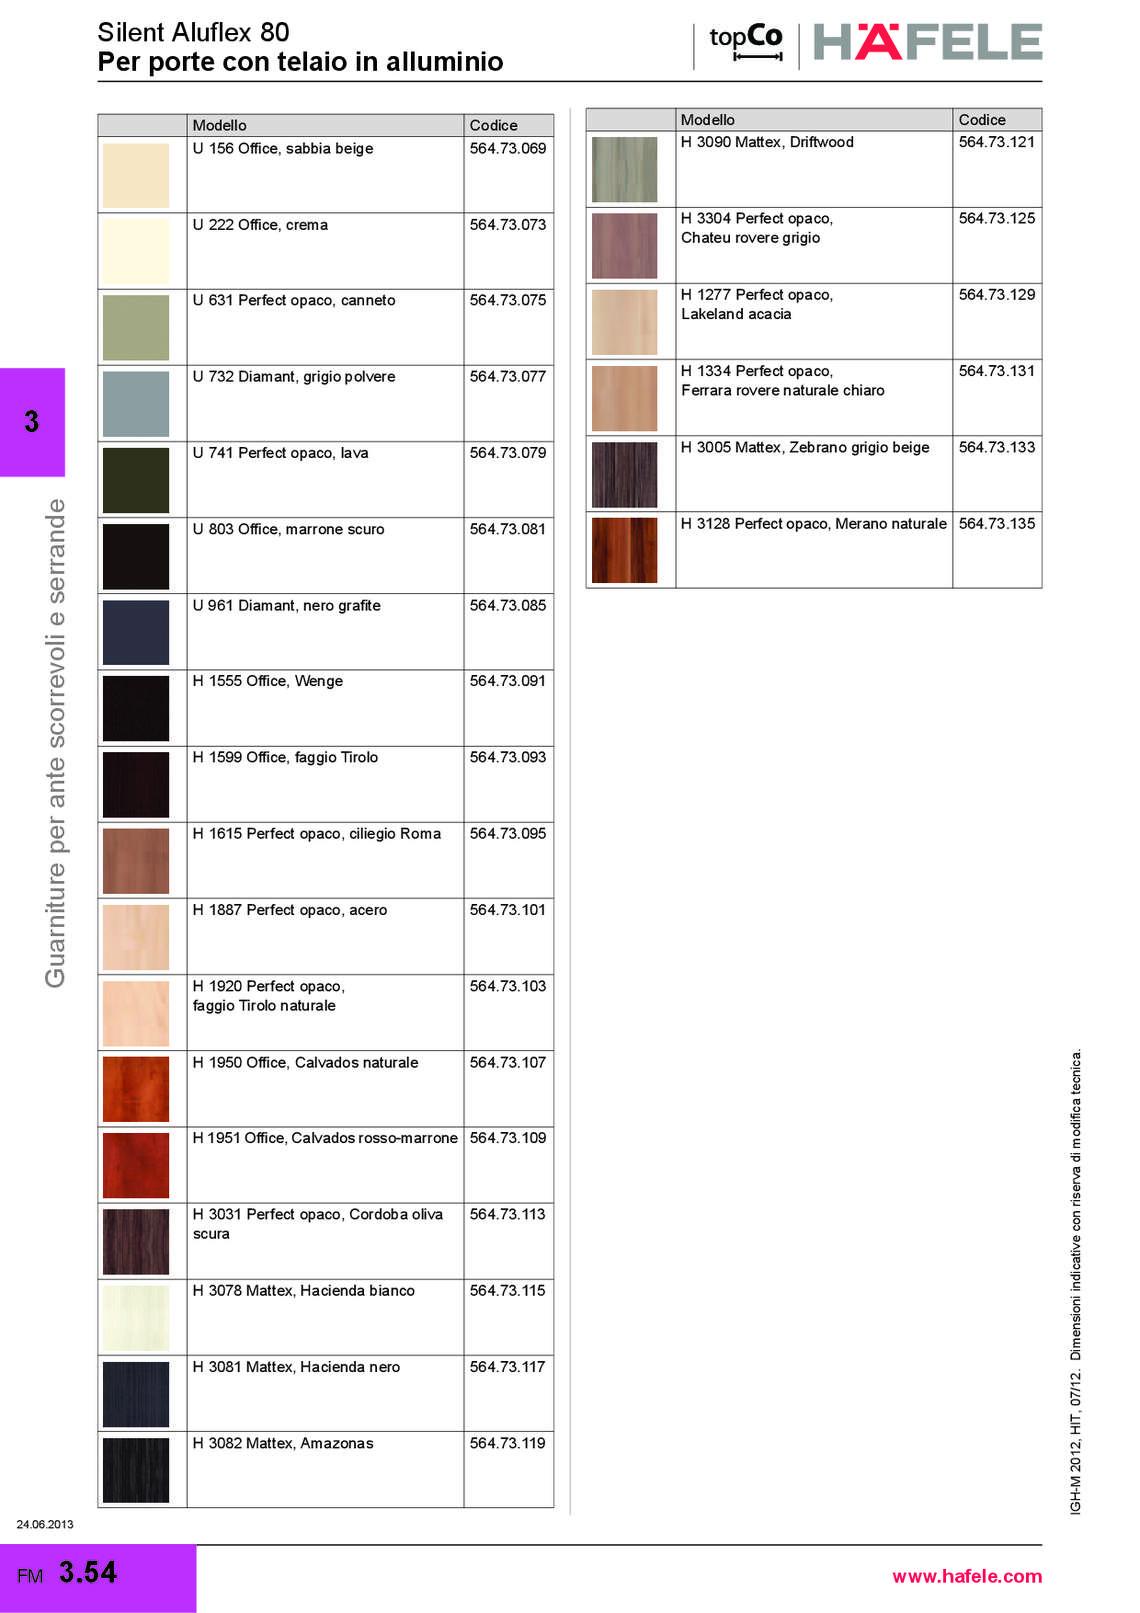 hafele-prodotti-su-misura_81_069.jpg